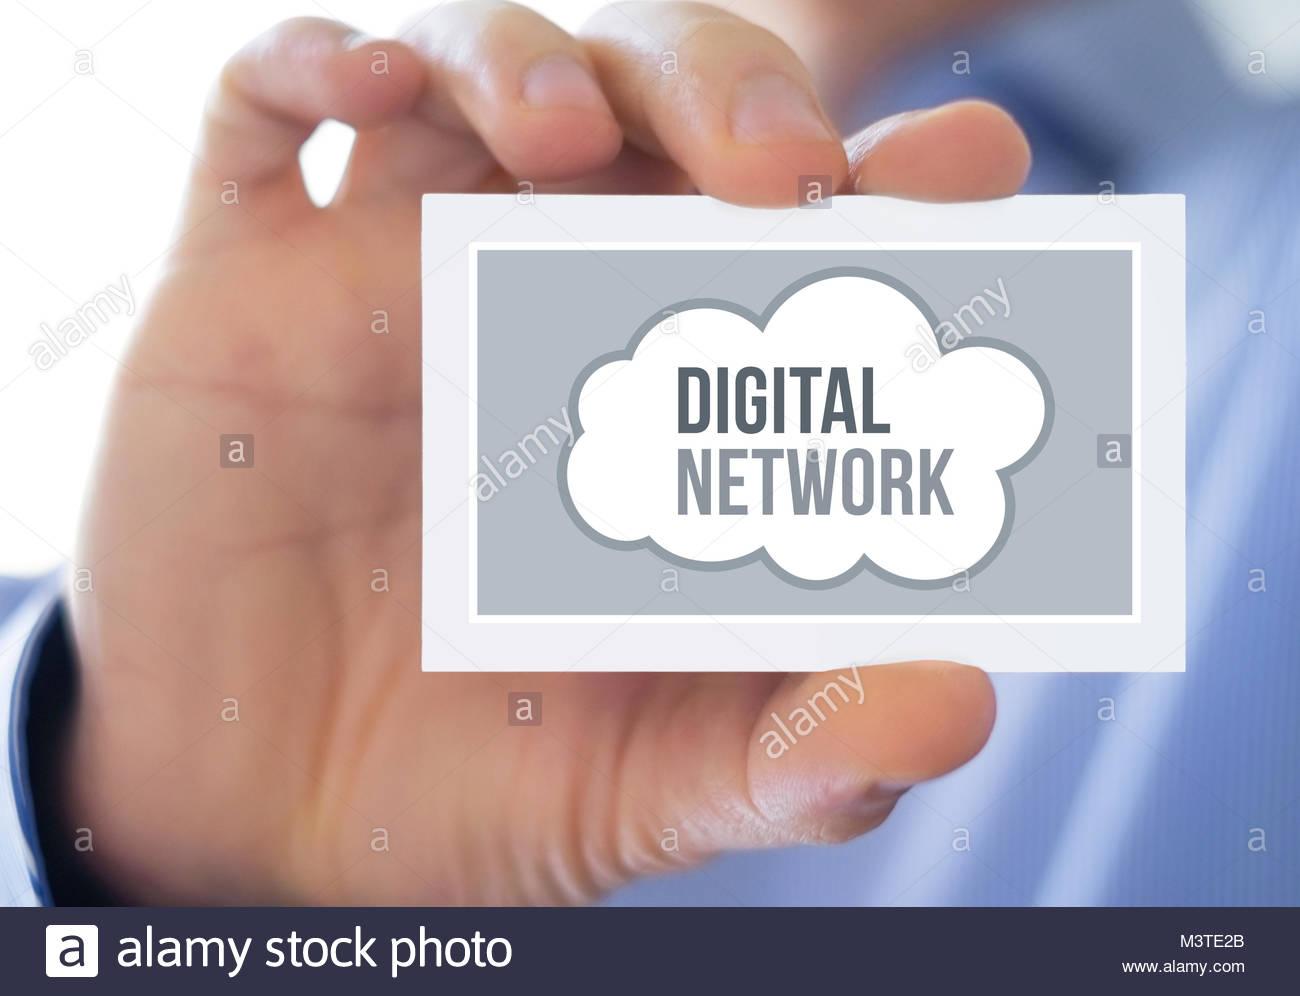 Digital Network - online mobility - Stock Image